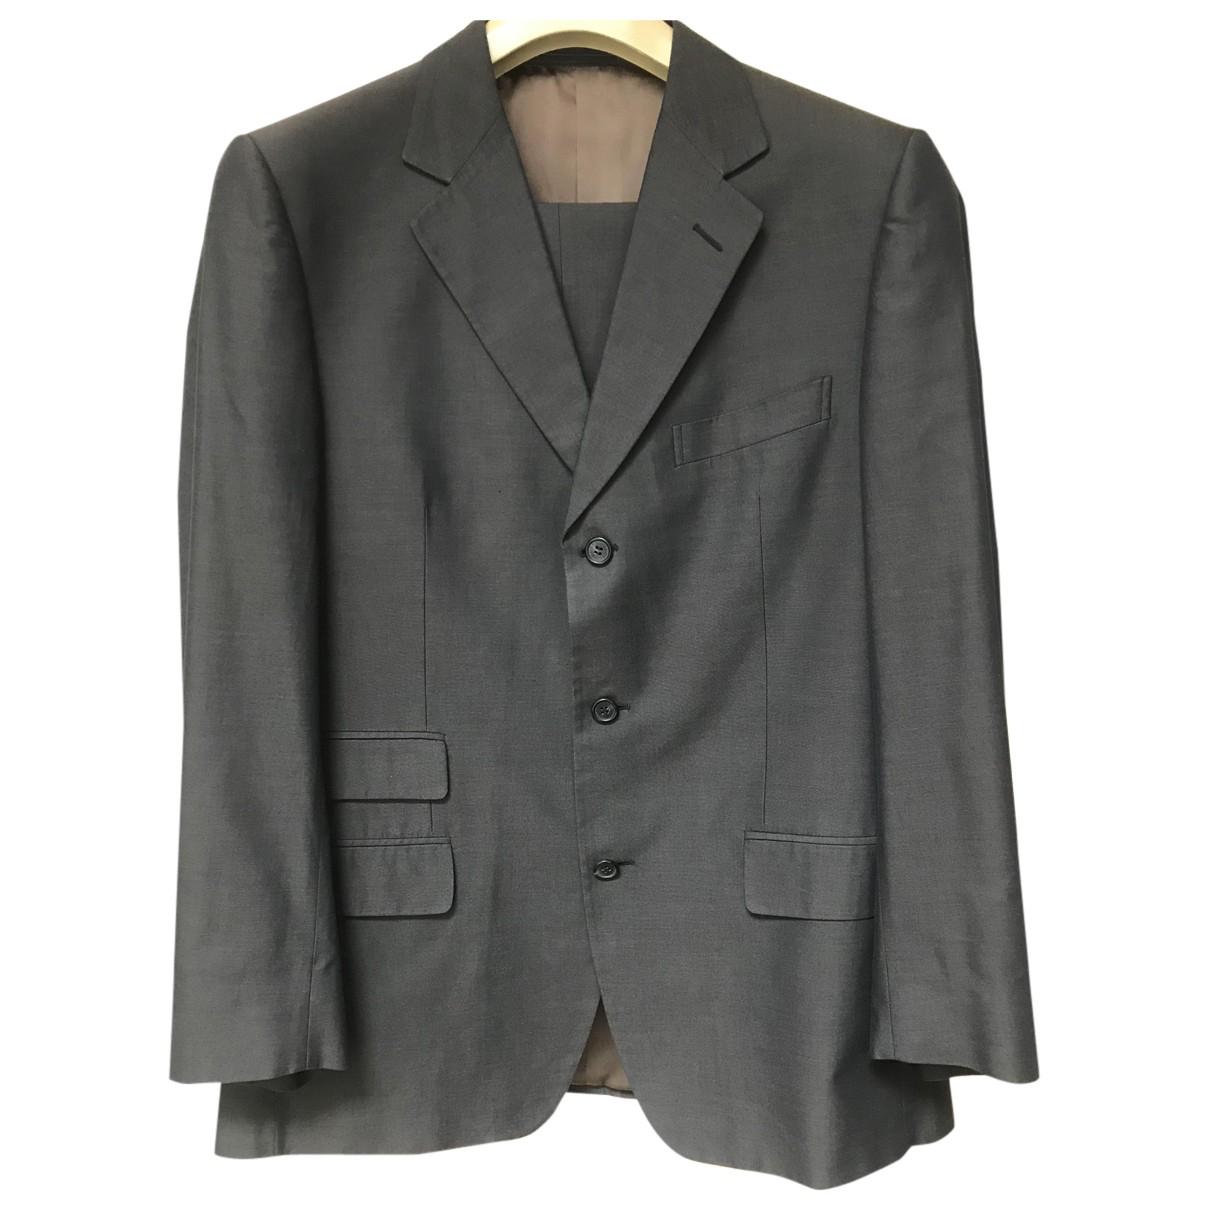 Gucci N Brown Cotton Suits for Men 50 IT